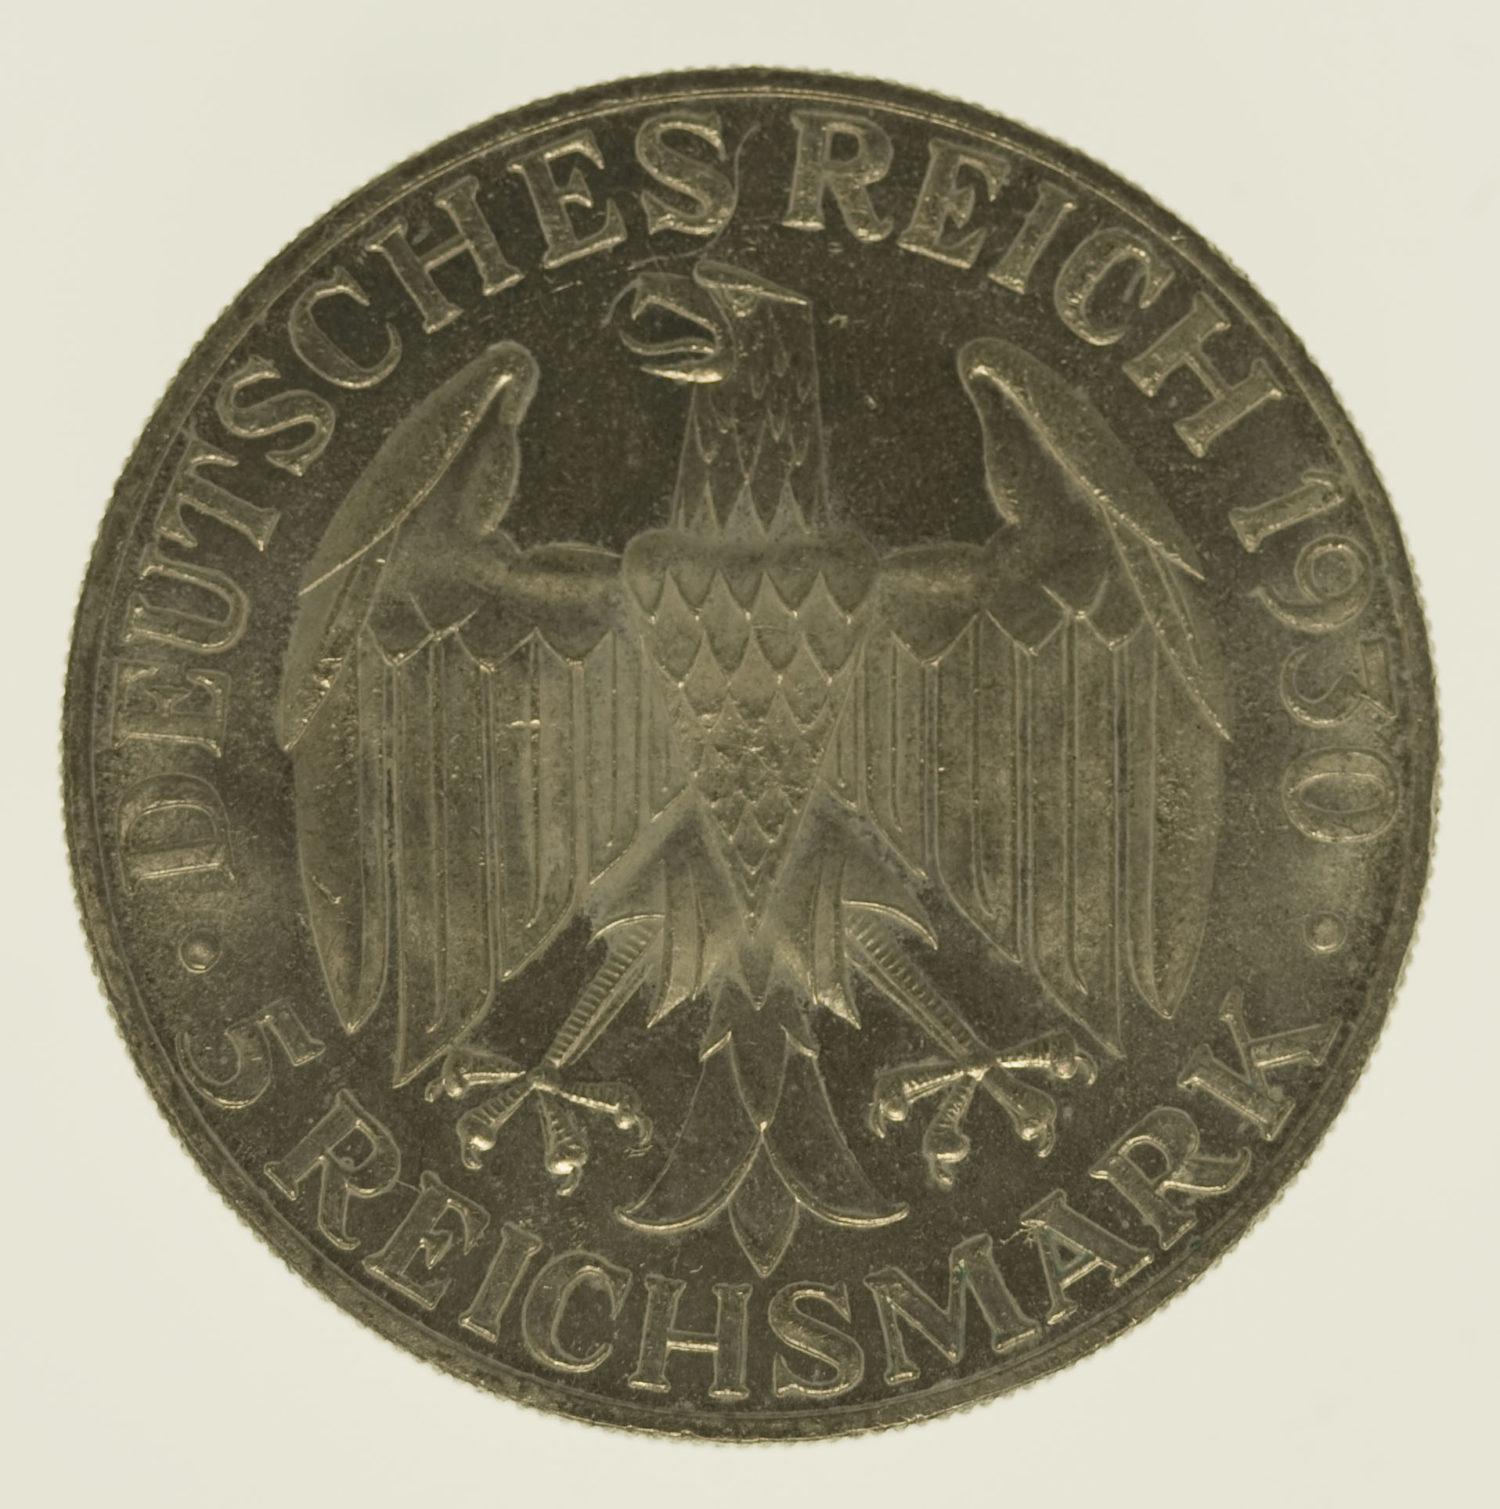 weimarer-republik-deutsche-silbermuenzen - Weimarer Republik 5 Reichsmark 1930 D Zeppelin